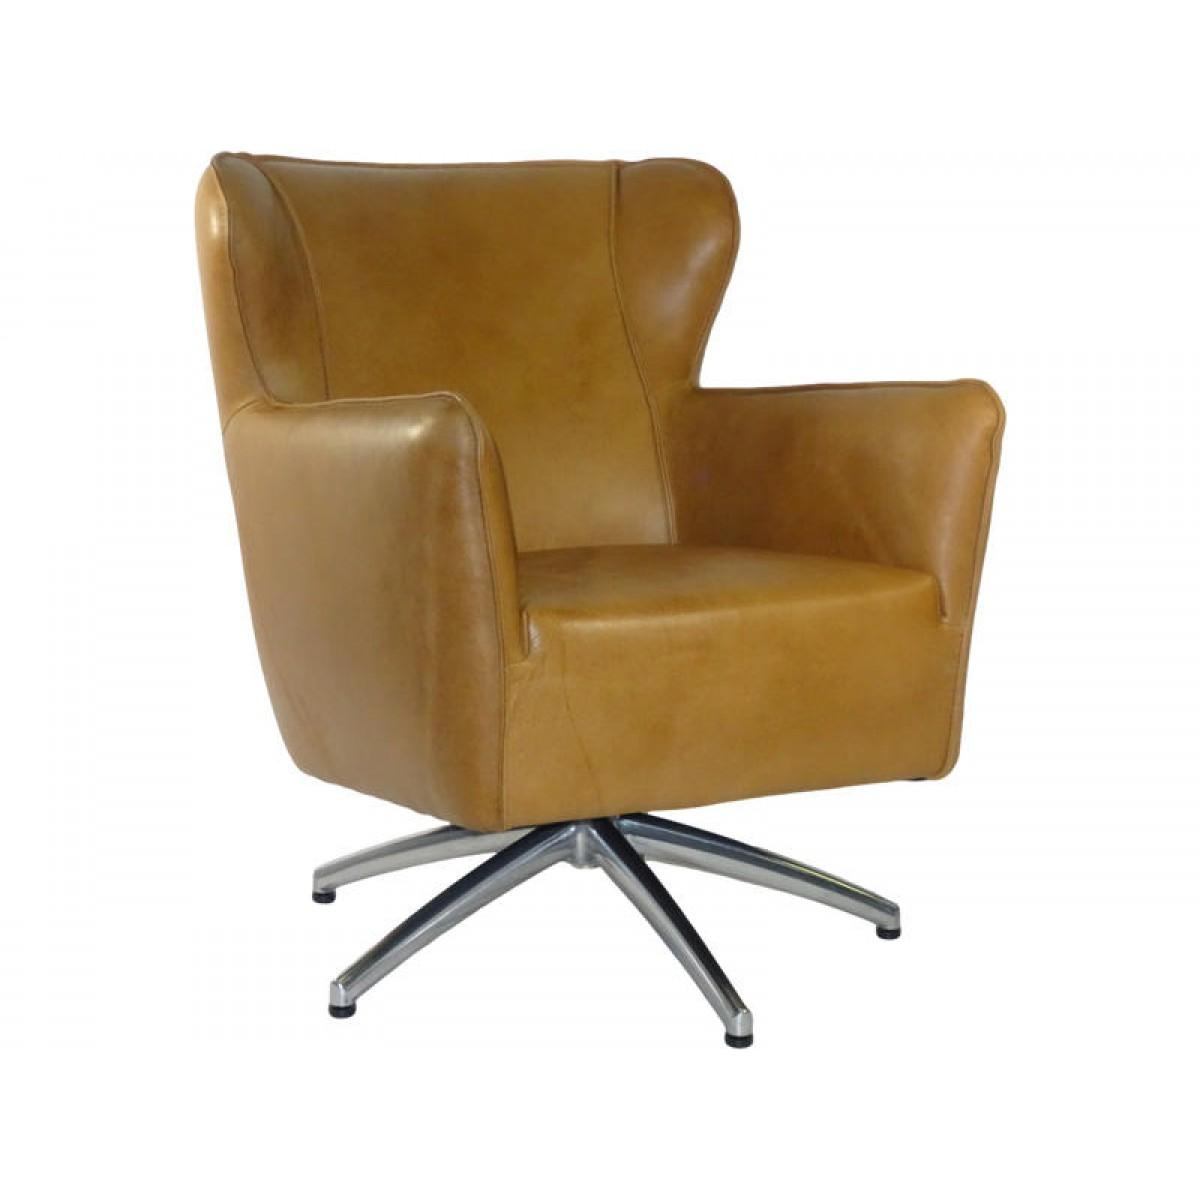 box-draai-fauteuil-he-design-leder-rancho-cognac